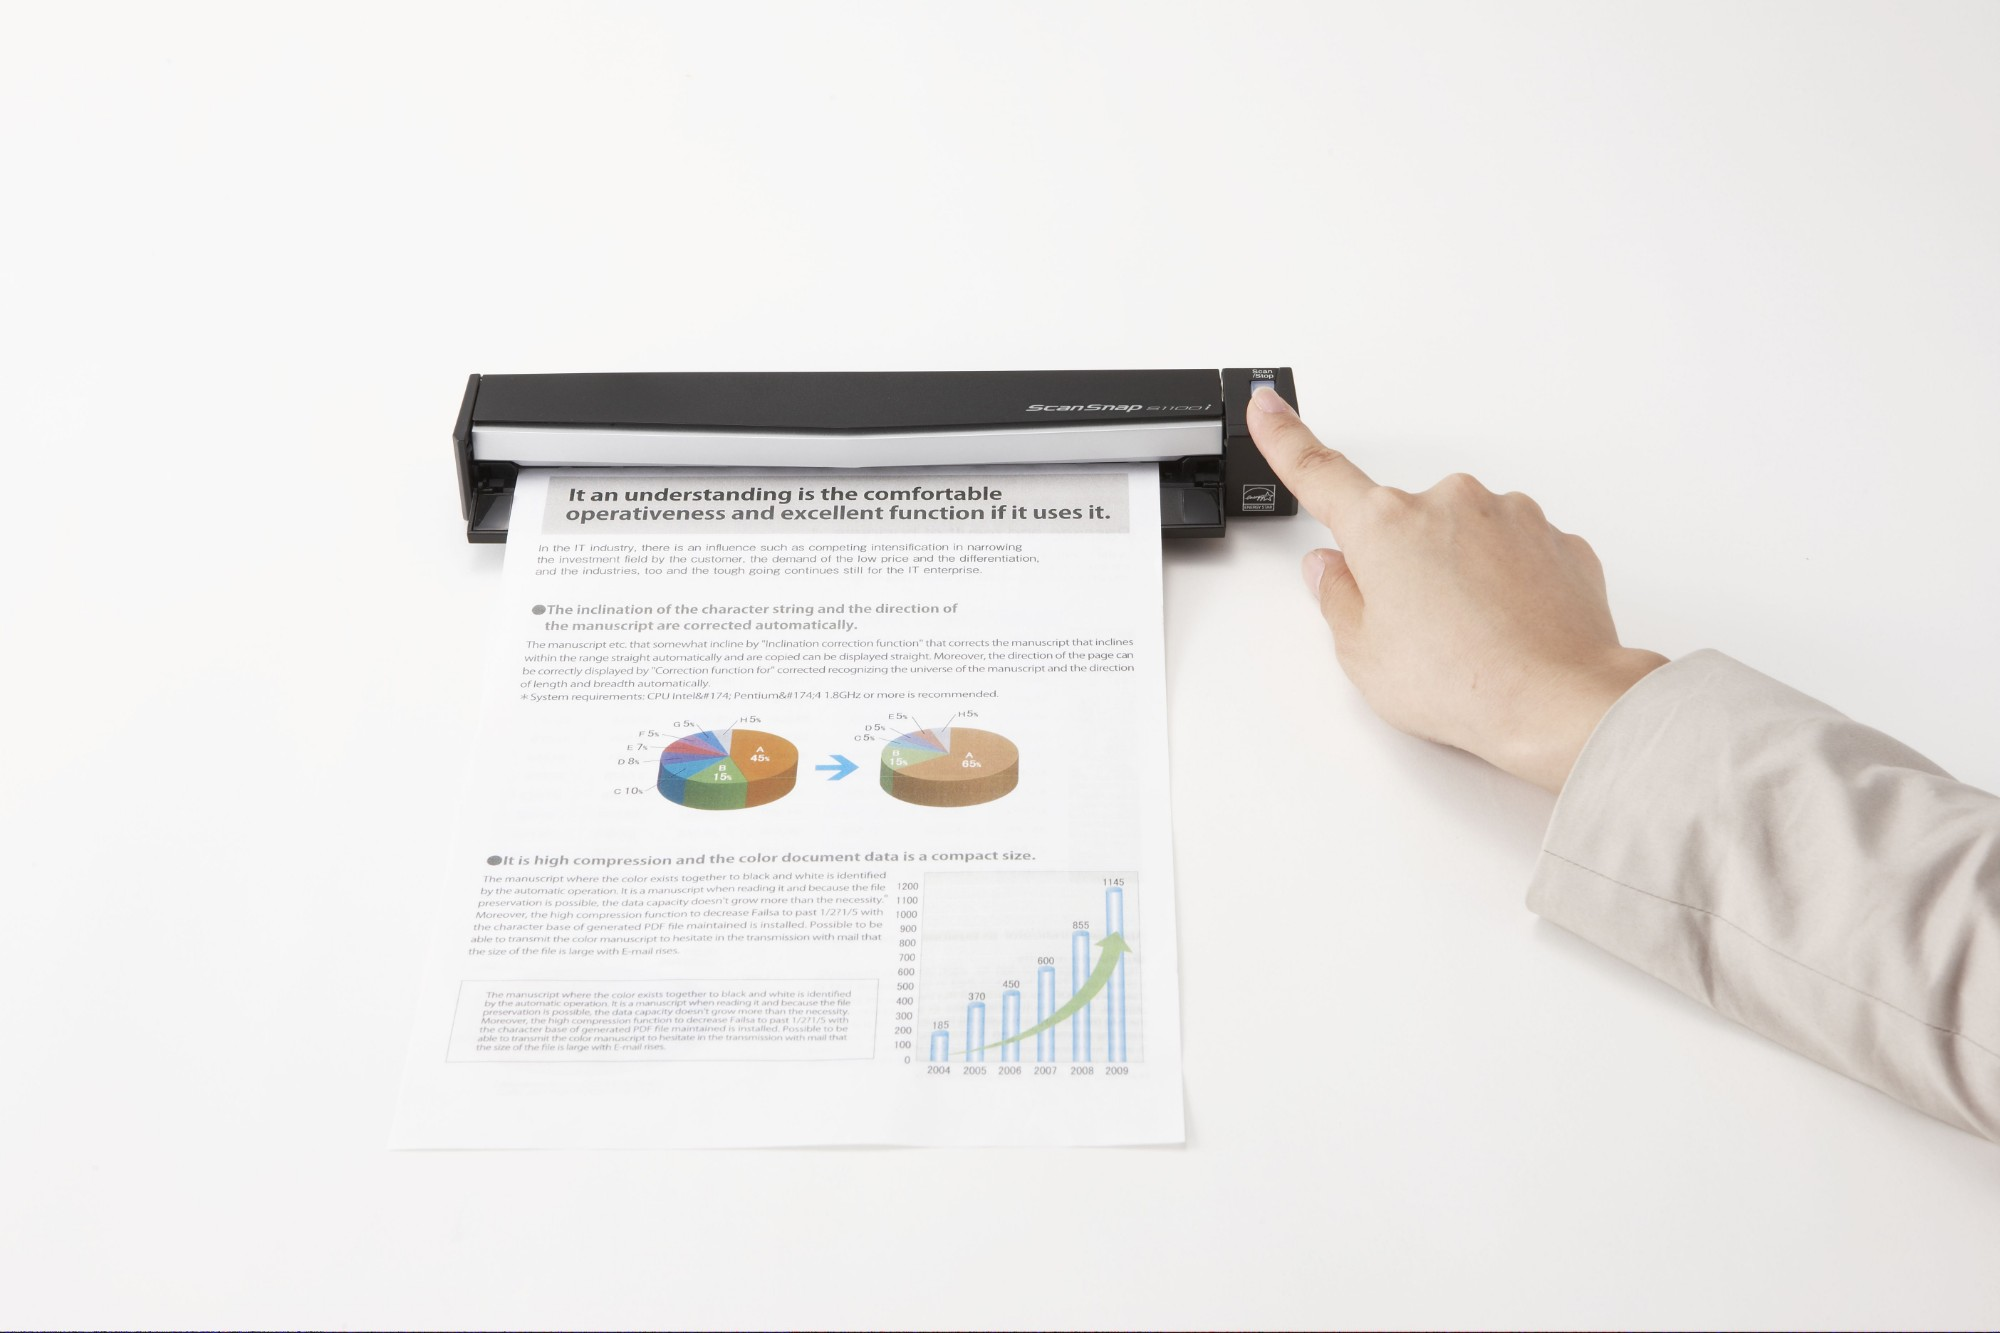 Fujitsu ScanSnap S1100i 600 x 600 DPI CDF + Sheet-fed scanner Black A4